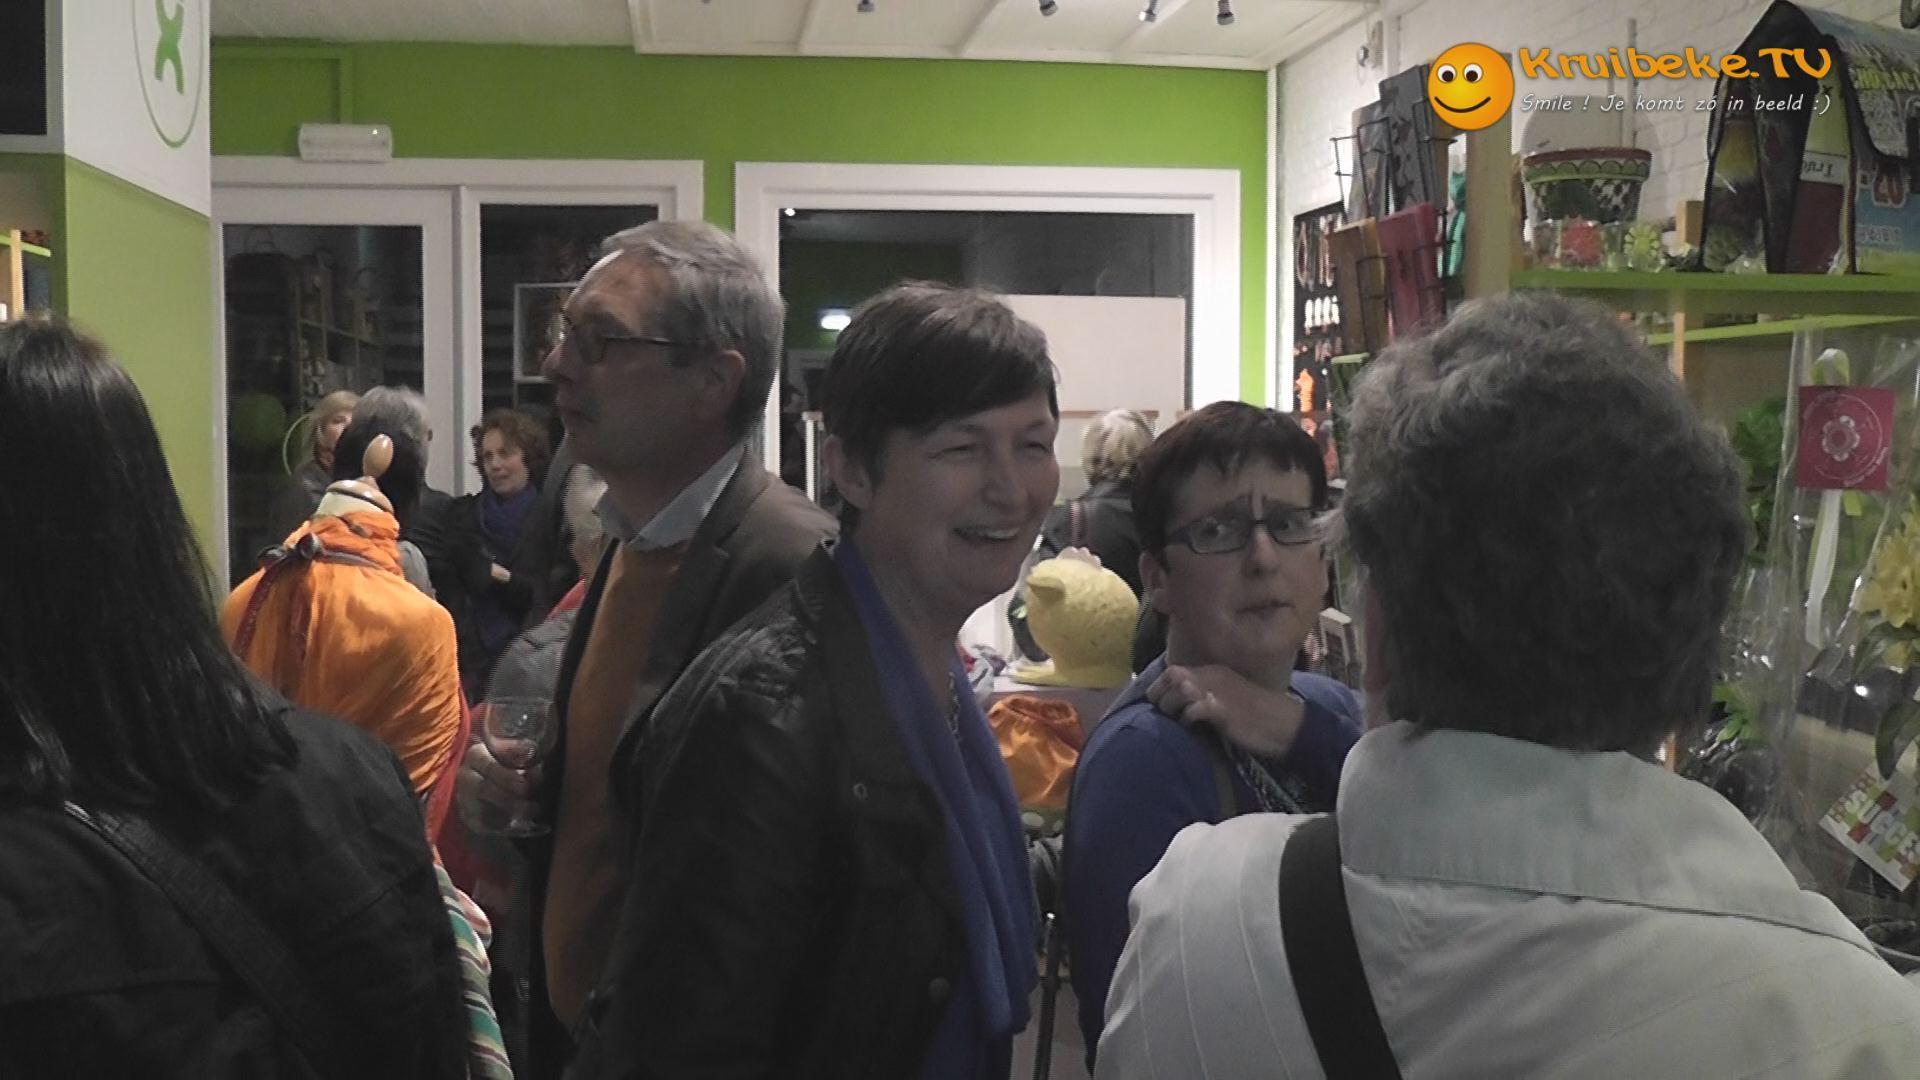 Oxfam Wereldwinkel Bazel verhuist naar Kruibeke